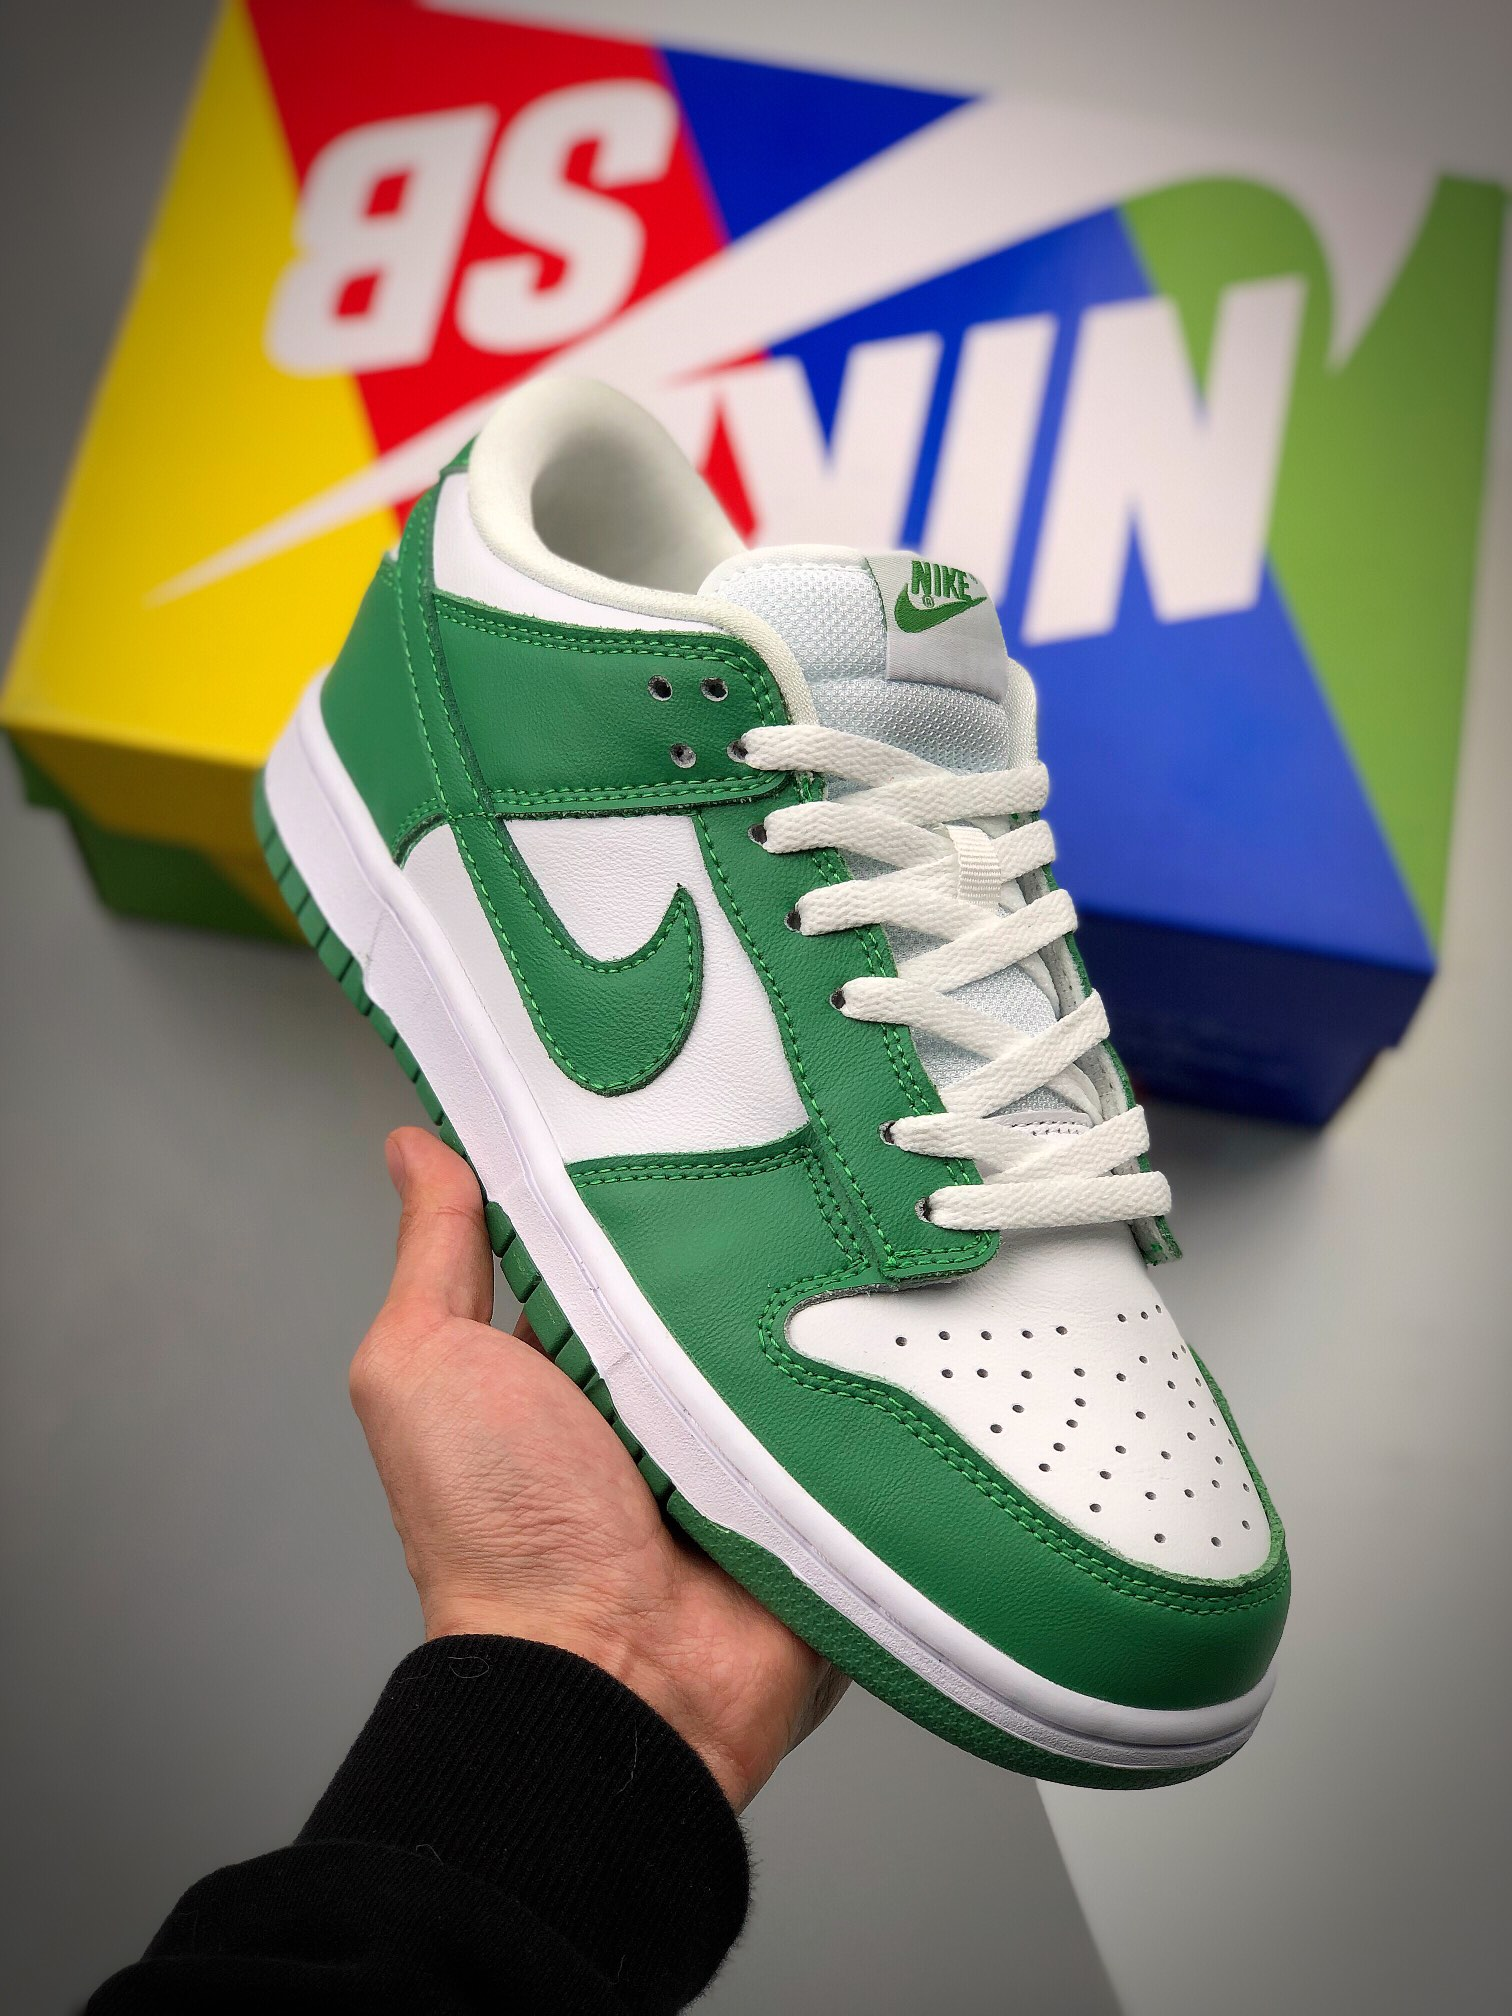 Nk SB Dunk Low SP Green Tender powder 2021 荧光绿低帮滑板鞋 CU1726-188_莆田鞋纯原什么水平